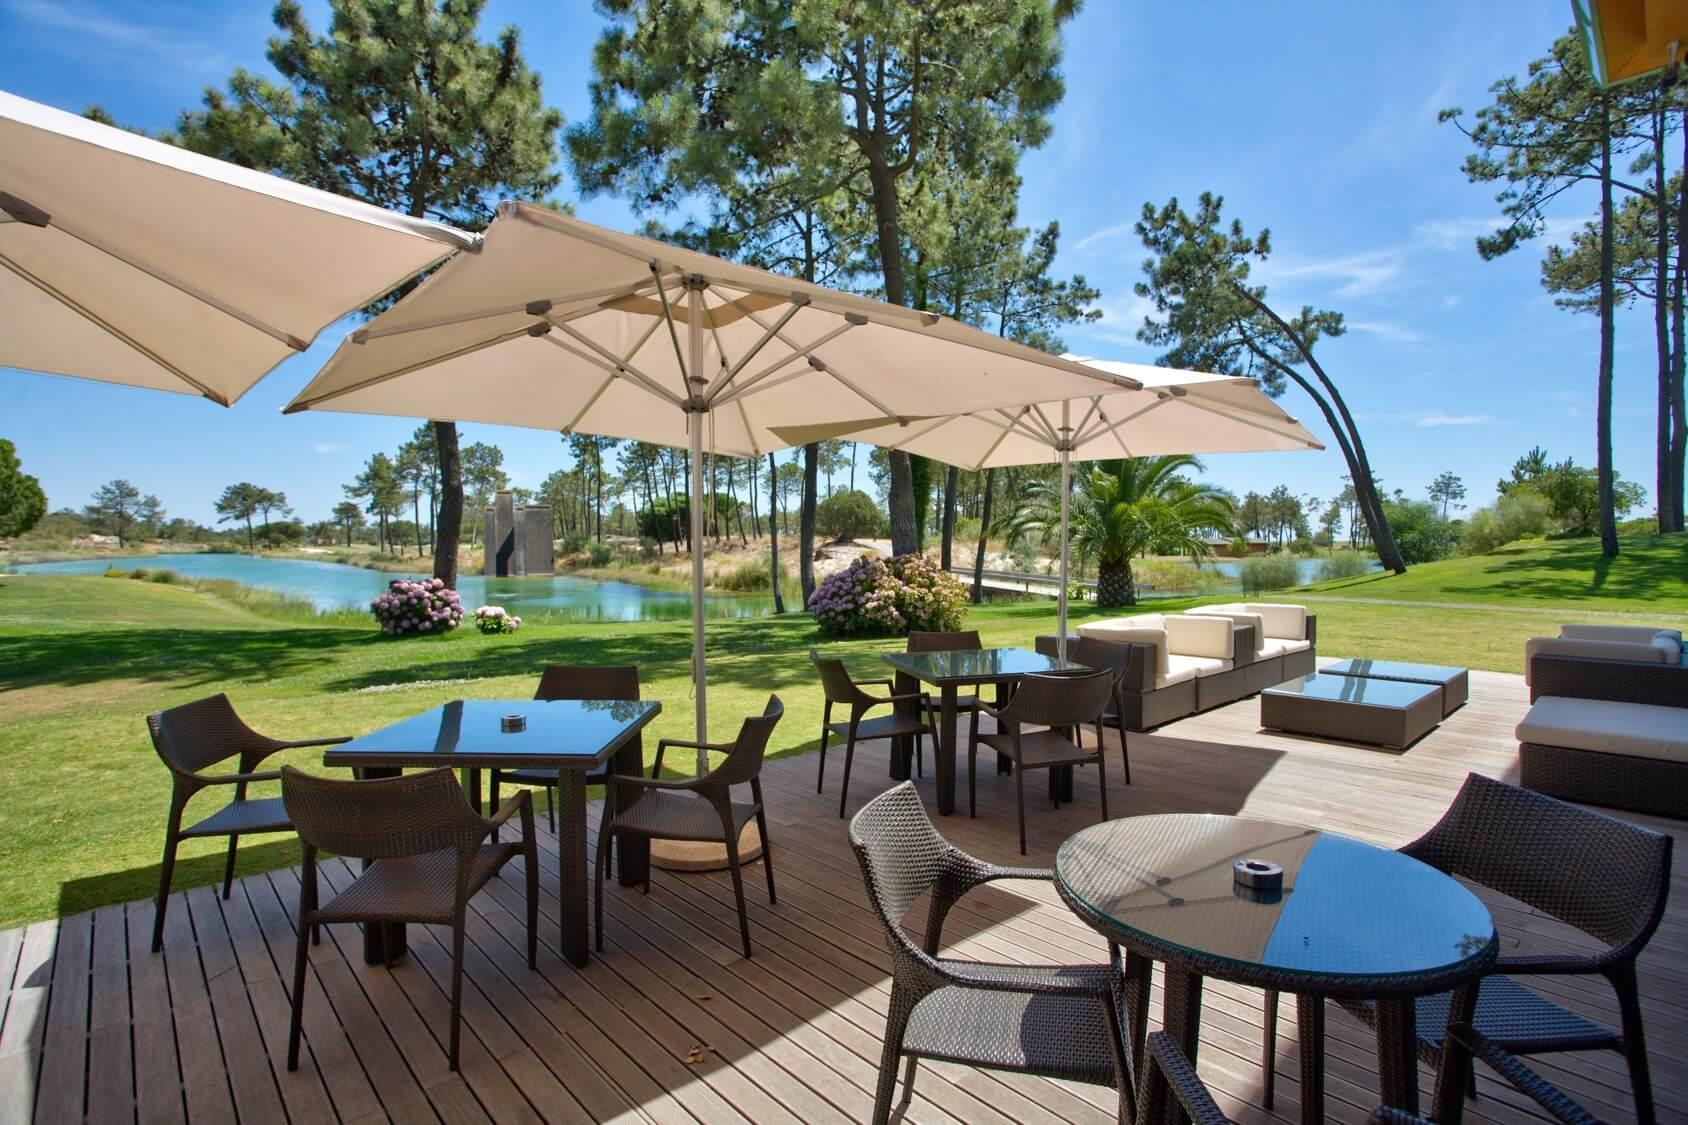 restaurante-clubhouse-troia-resort-portugal-03